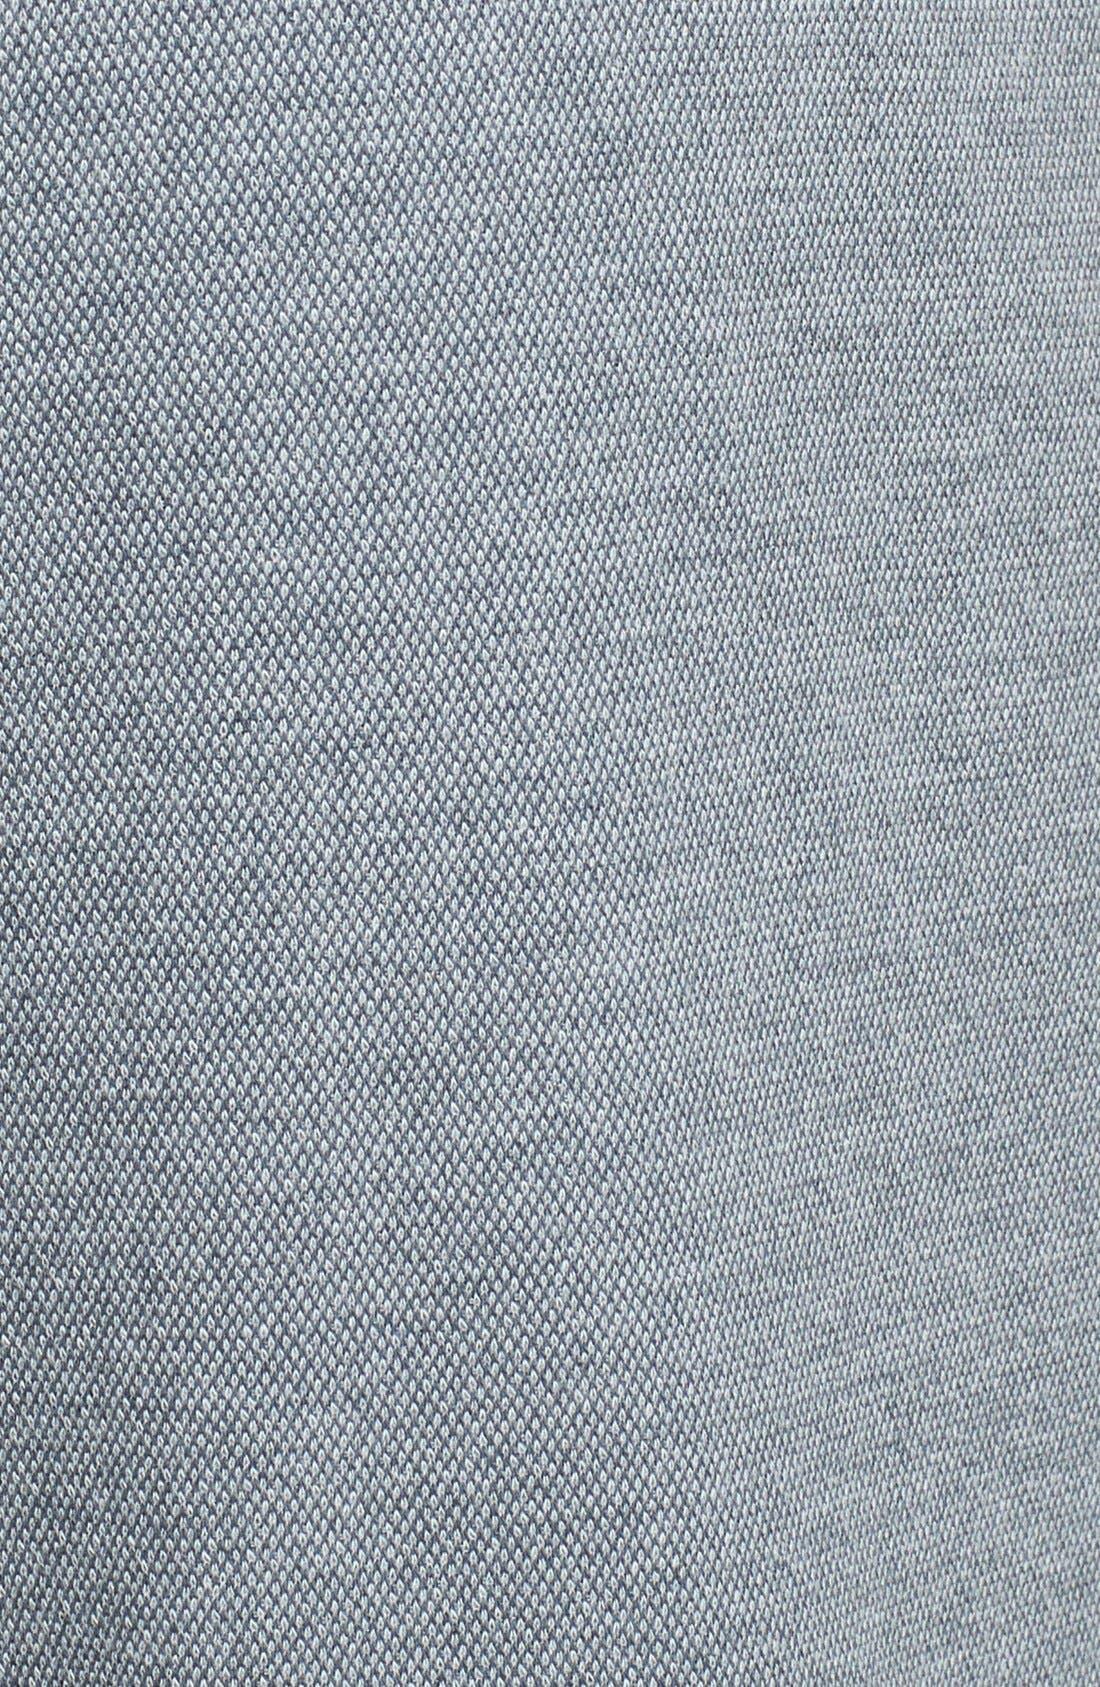 Alternate Image 3  - adidas 'Epic' Herringbone Knit Pants